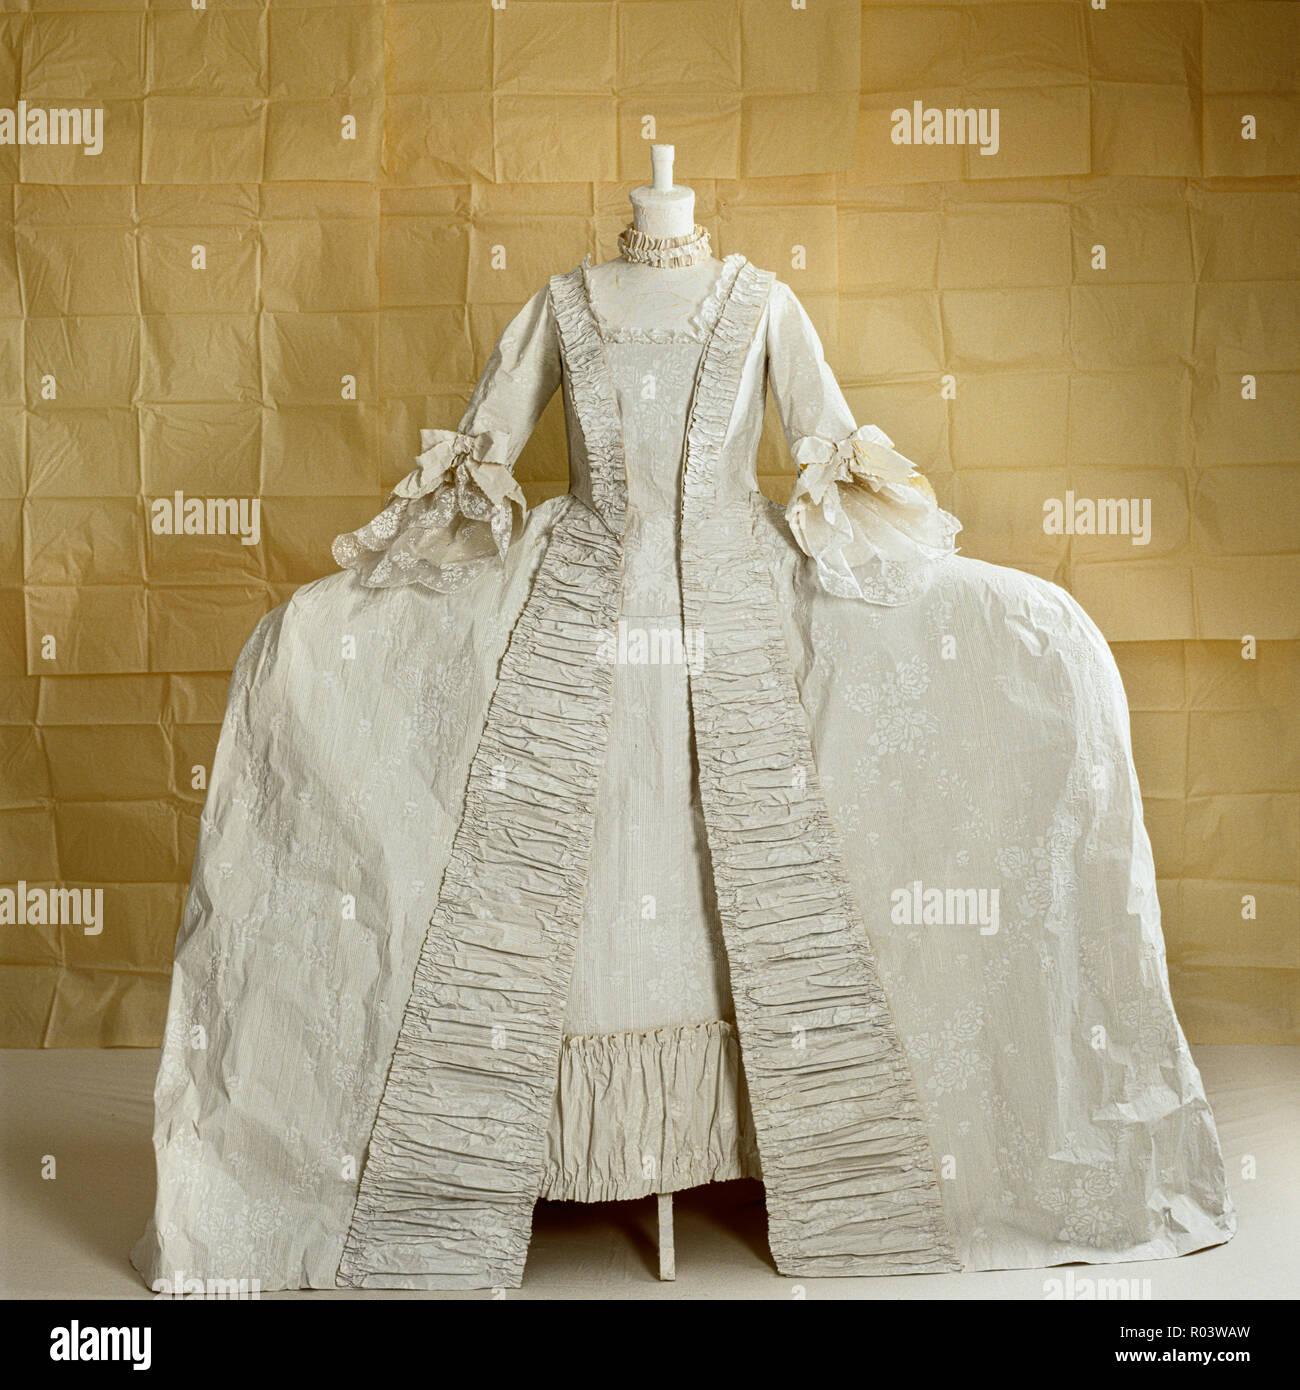 3 Hoops Petticoats for Wedding Dress Crinoline For Ball Gown cp DSUK